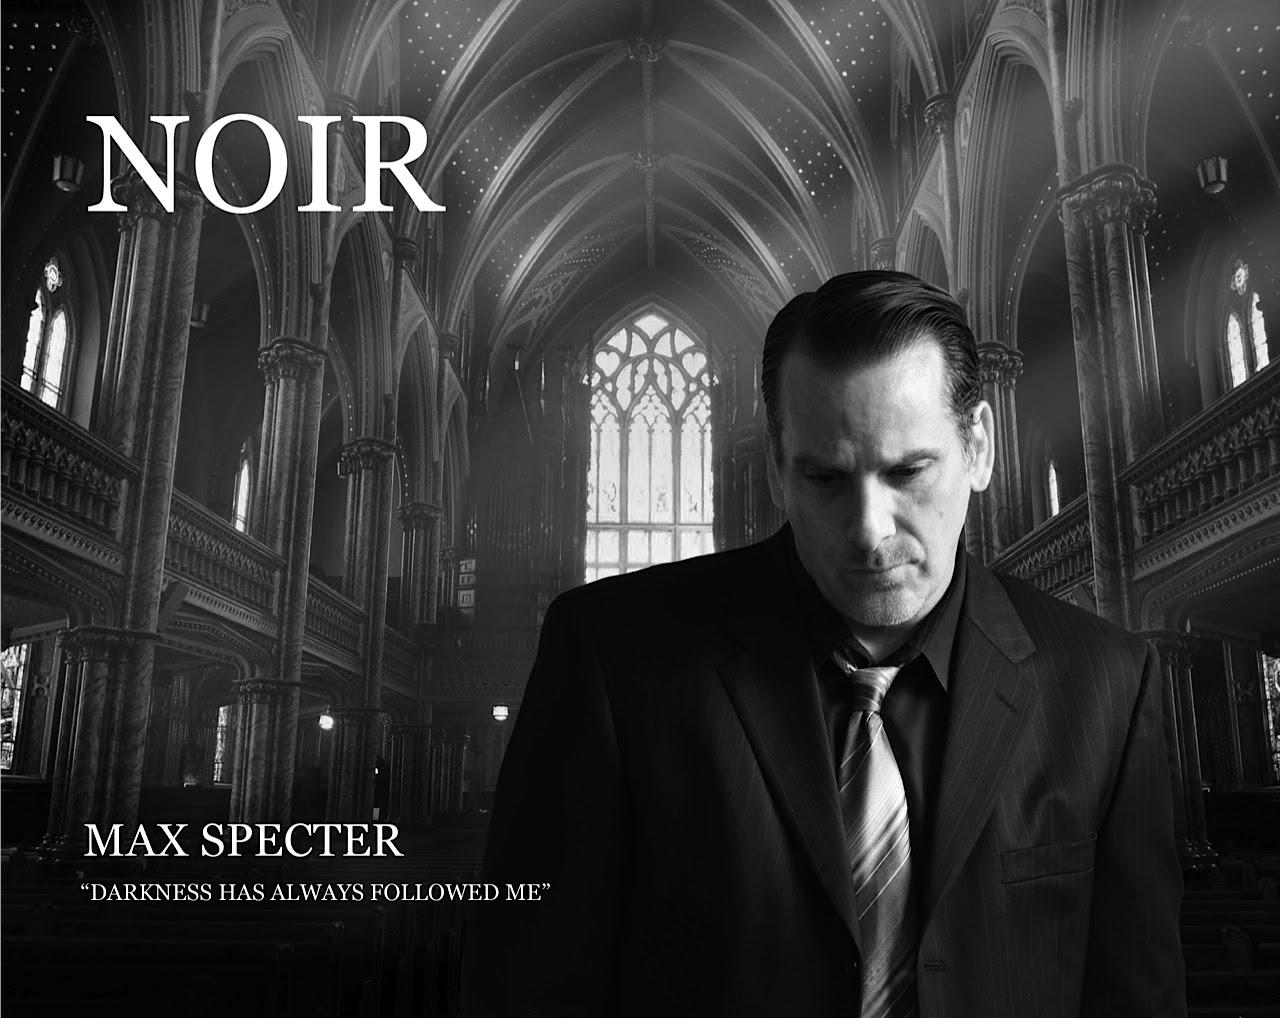 http://noirthefilm.blogspot.com/